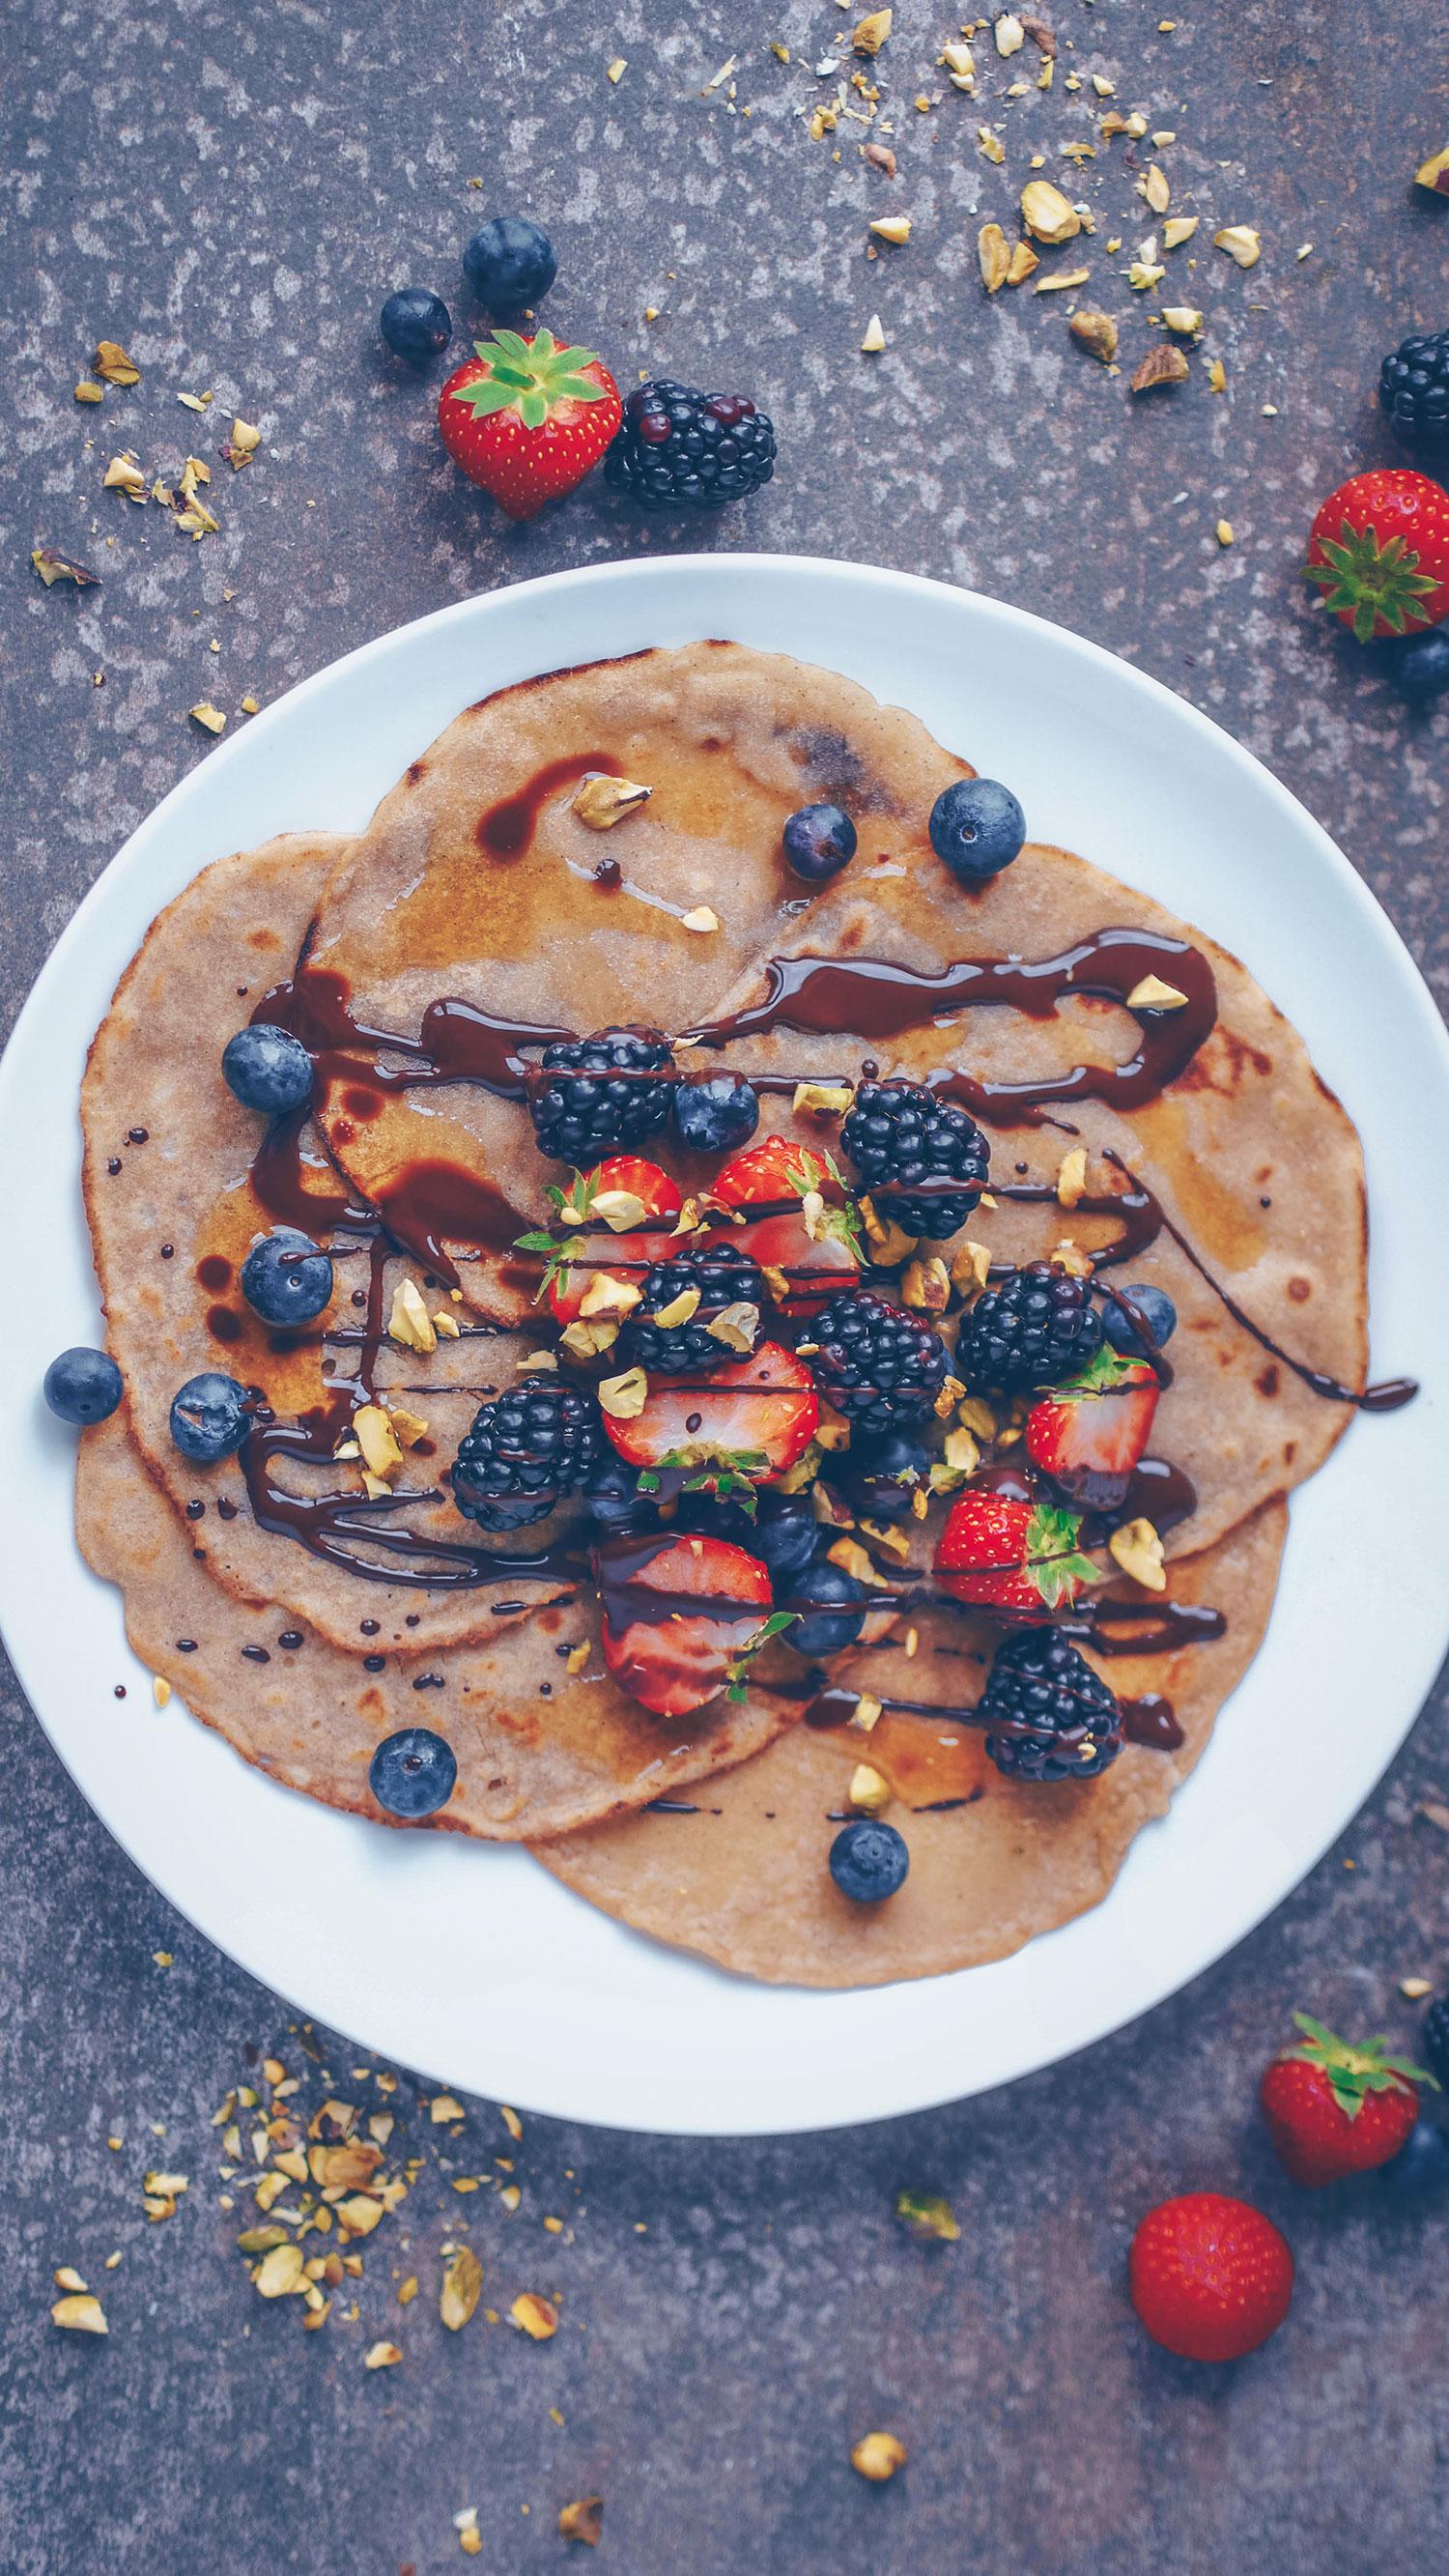 Simple Gluten-free Vegan Crepes